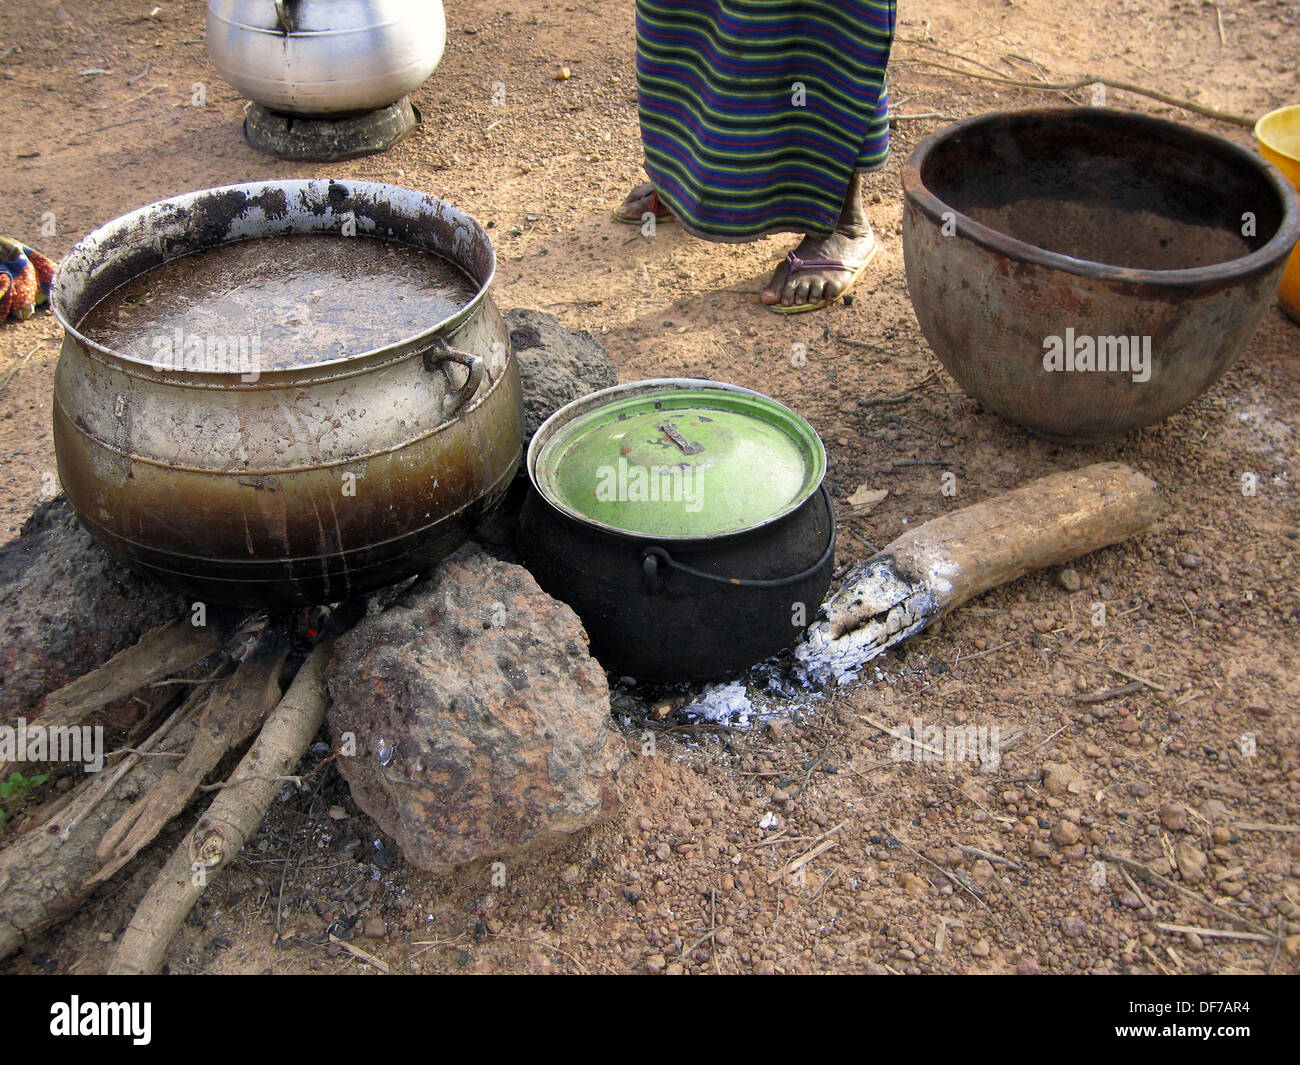 Cooking utensils at Senoufo village. Sikasso region, Mali - Stock Image